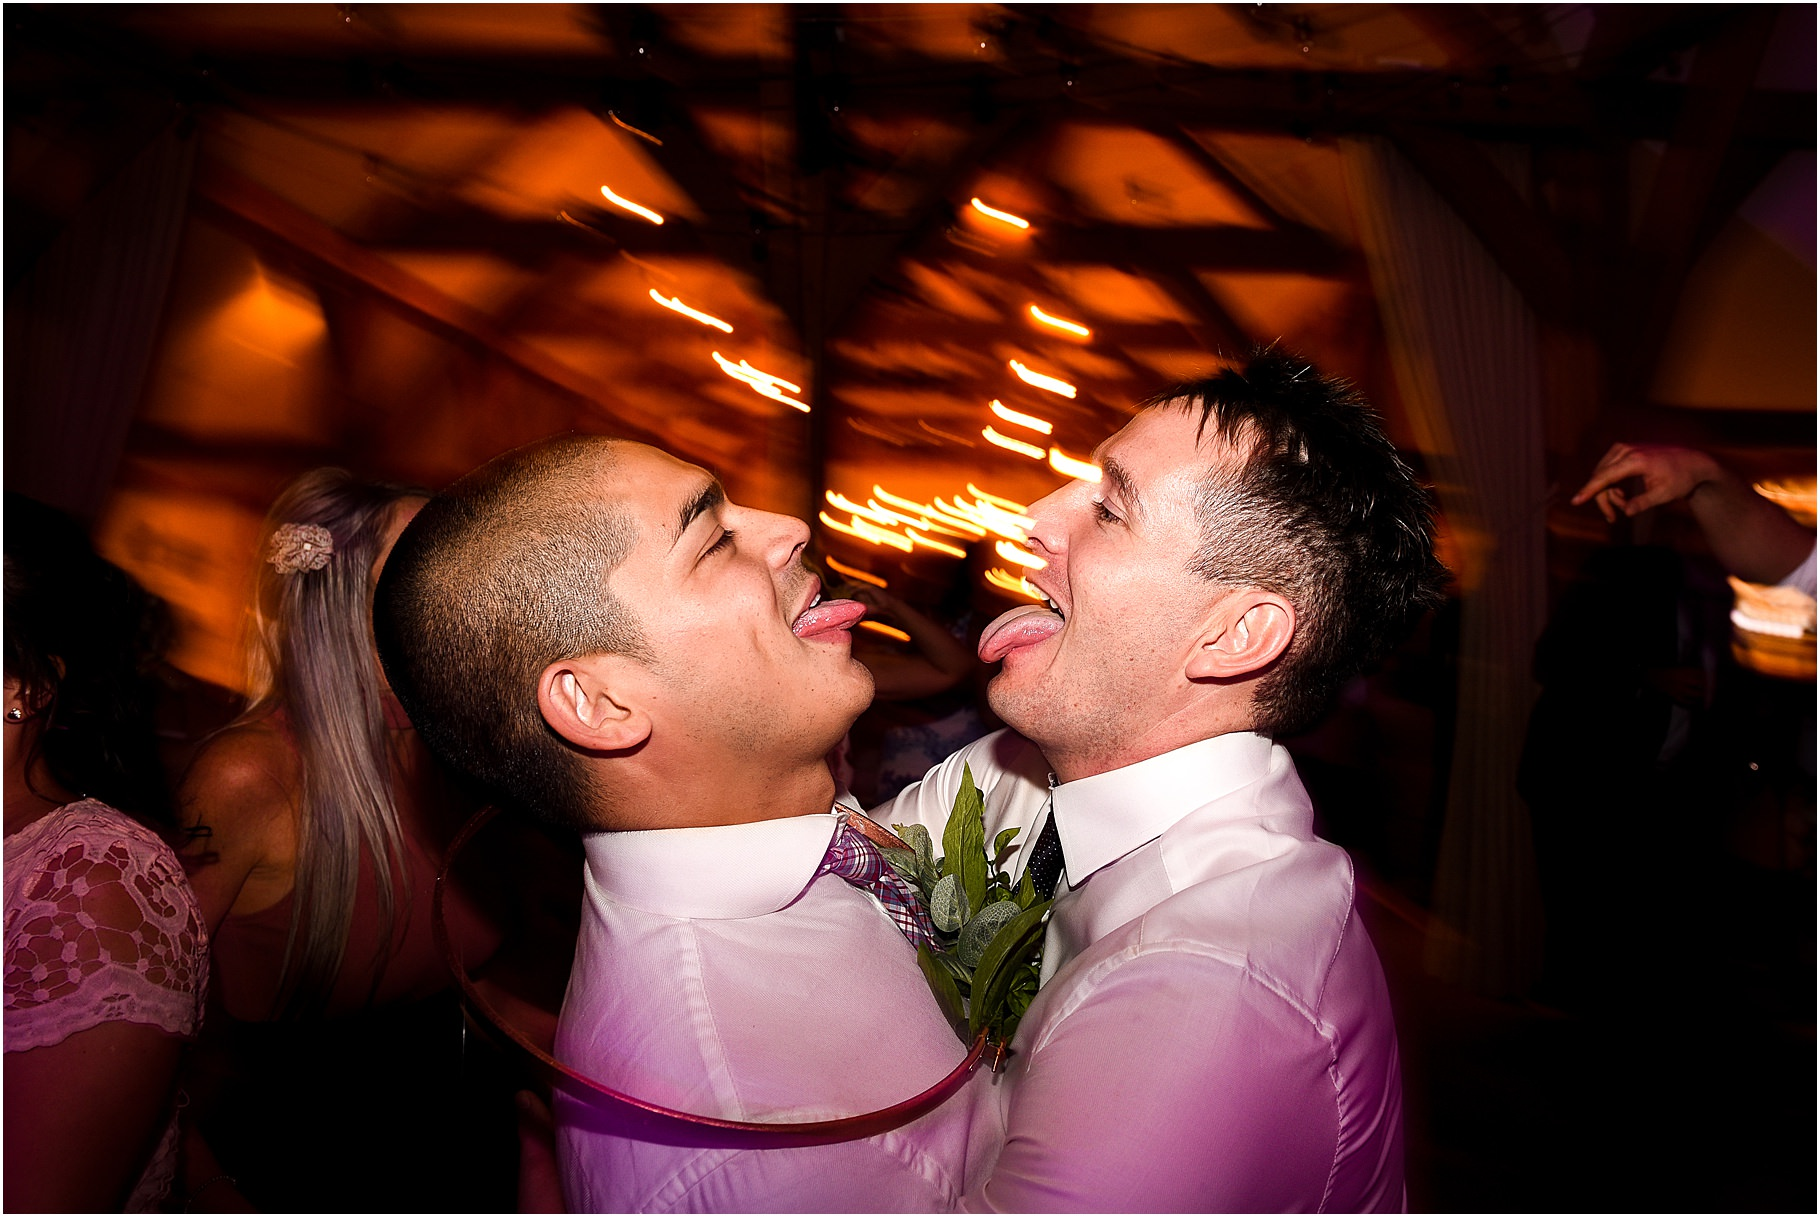 dan-wootton-photography-2017-weddings-008.jpg